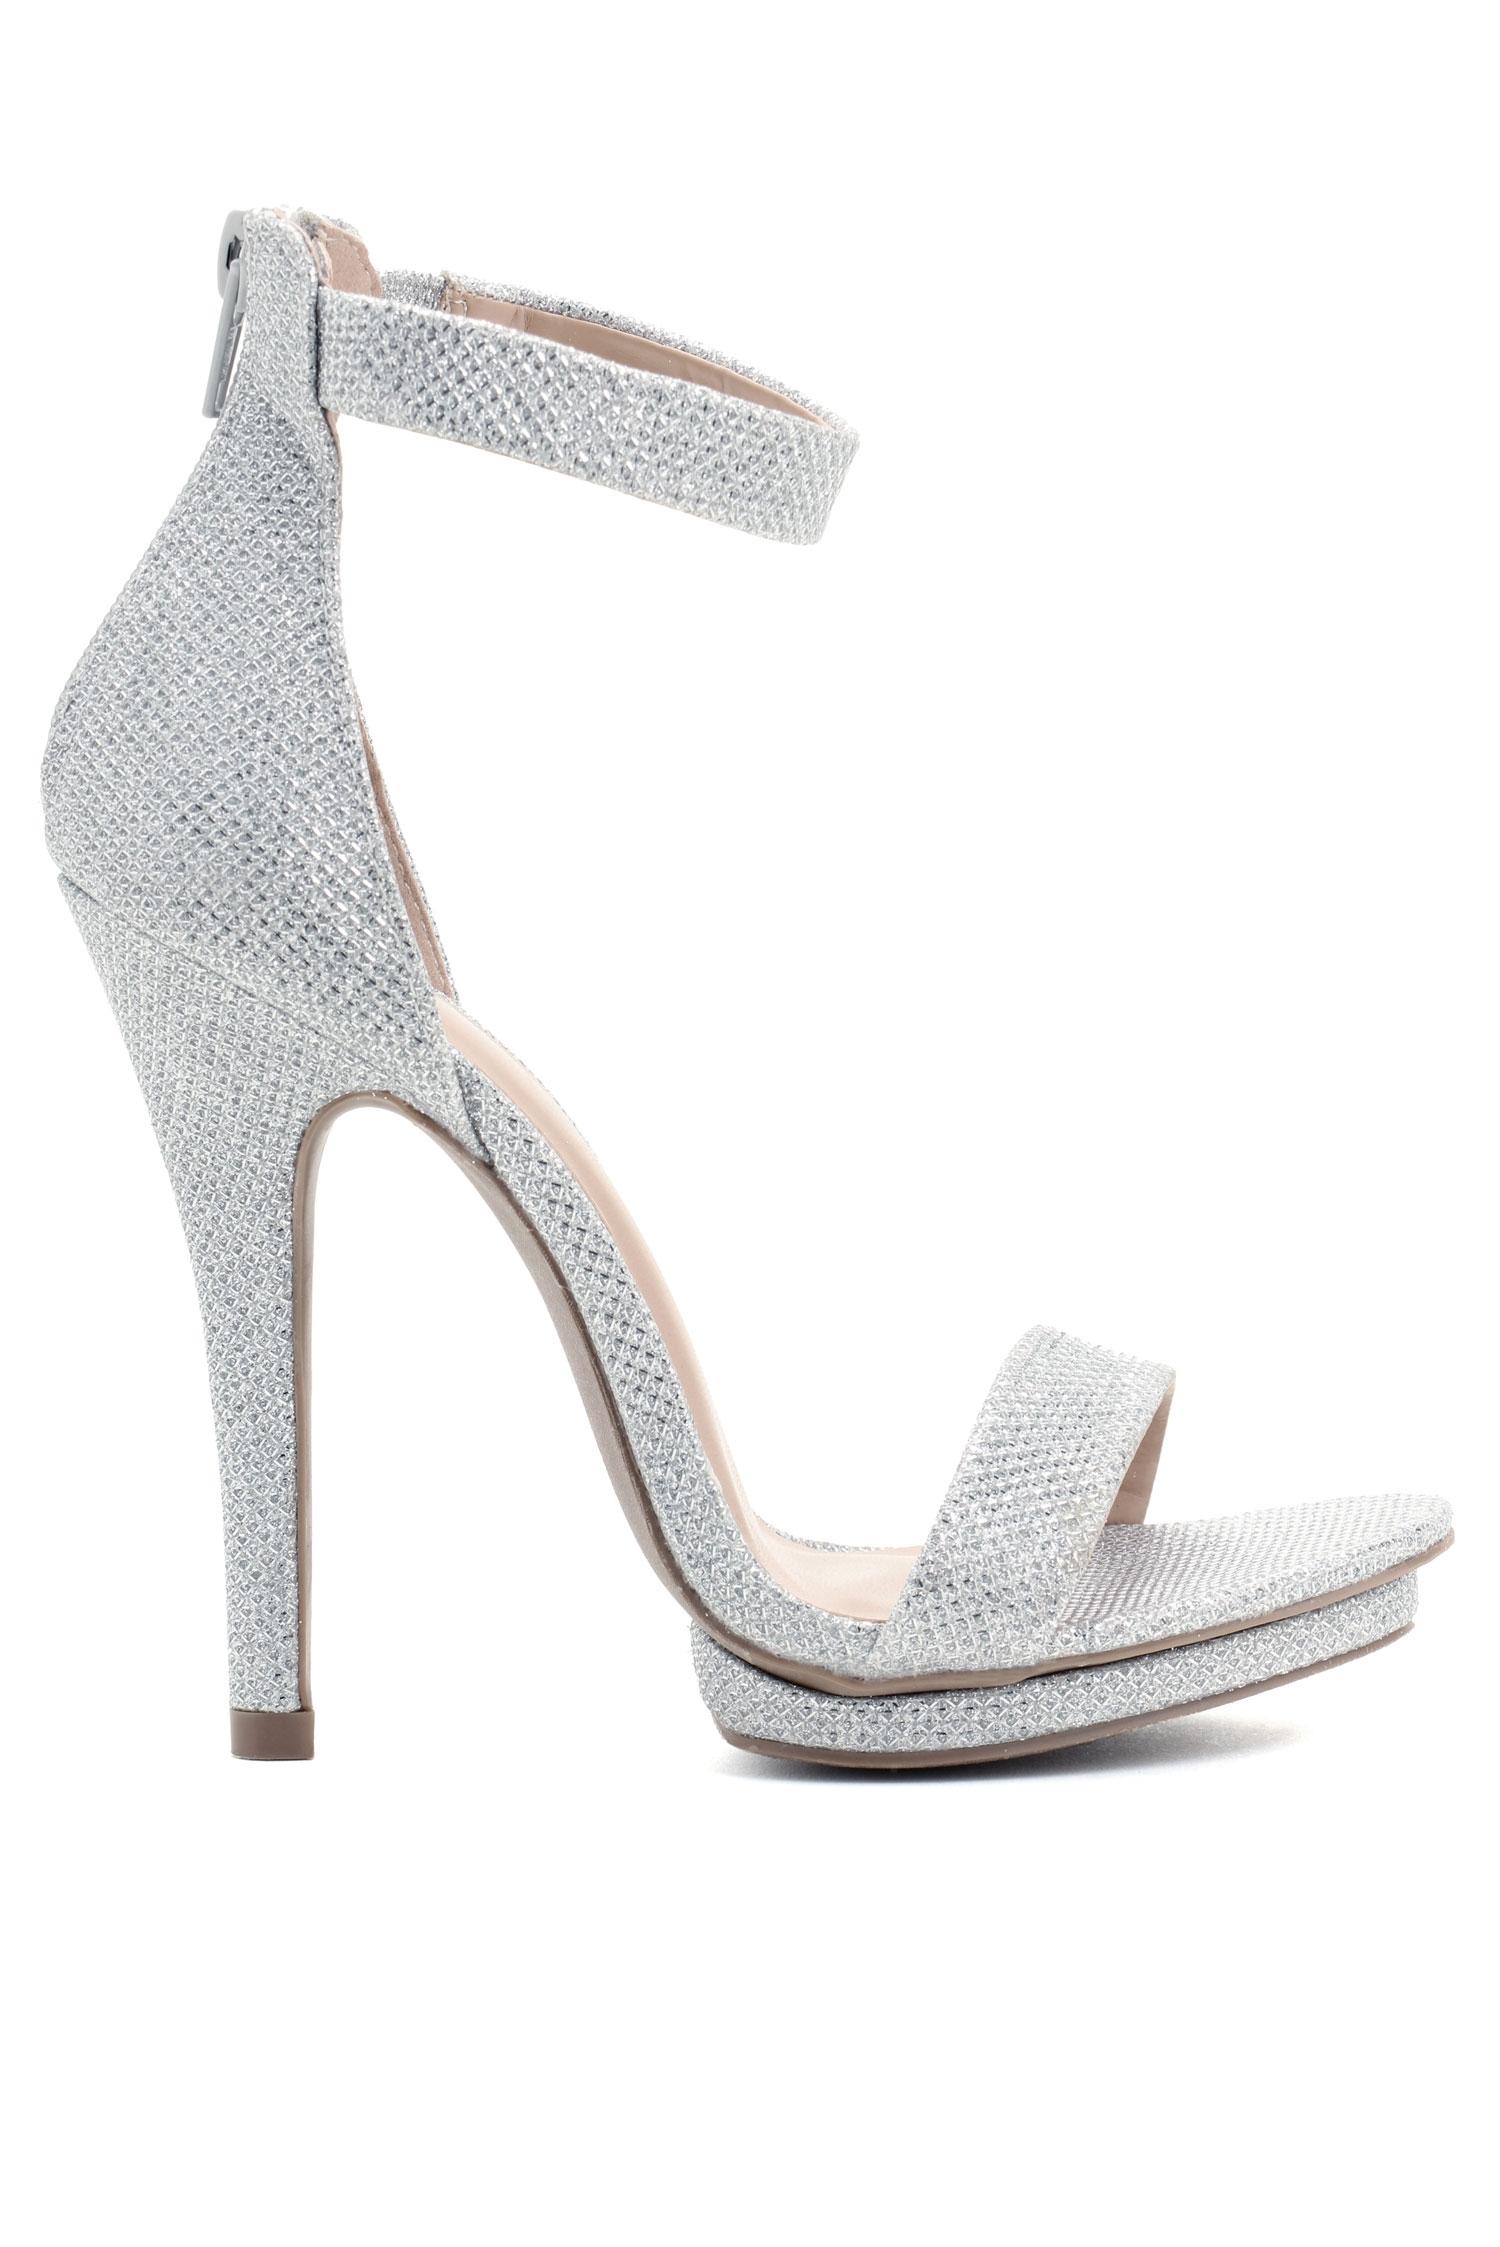 silver heels silver socialite heels BMLEHMQ